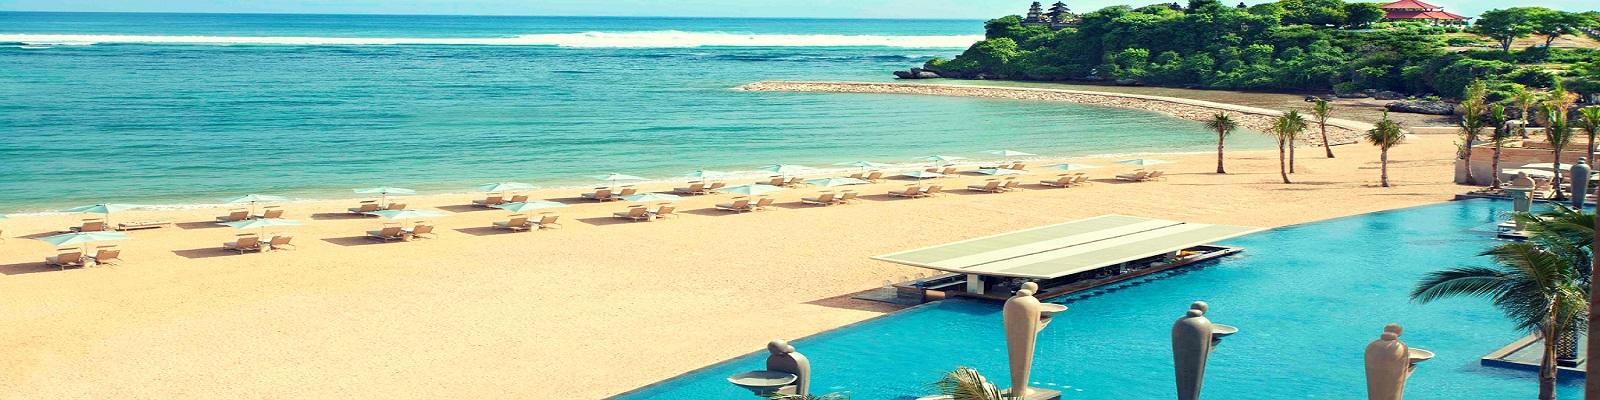 Bali the Traveller's Paradise